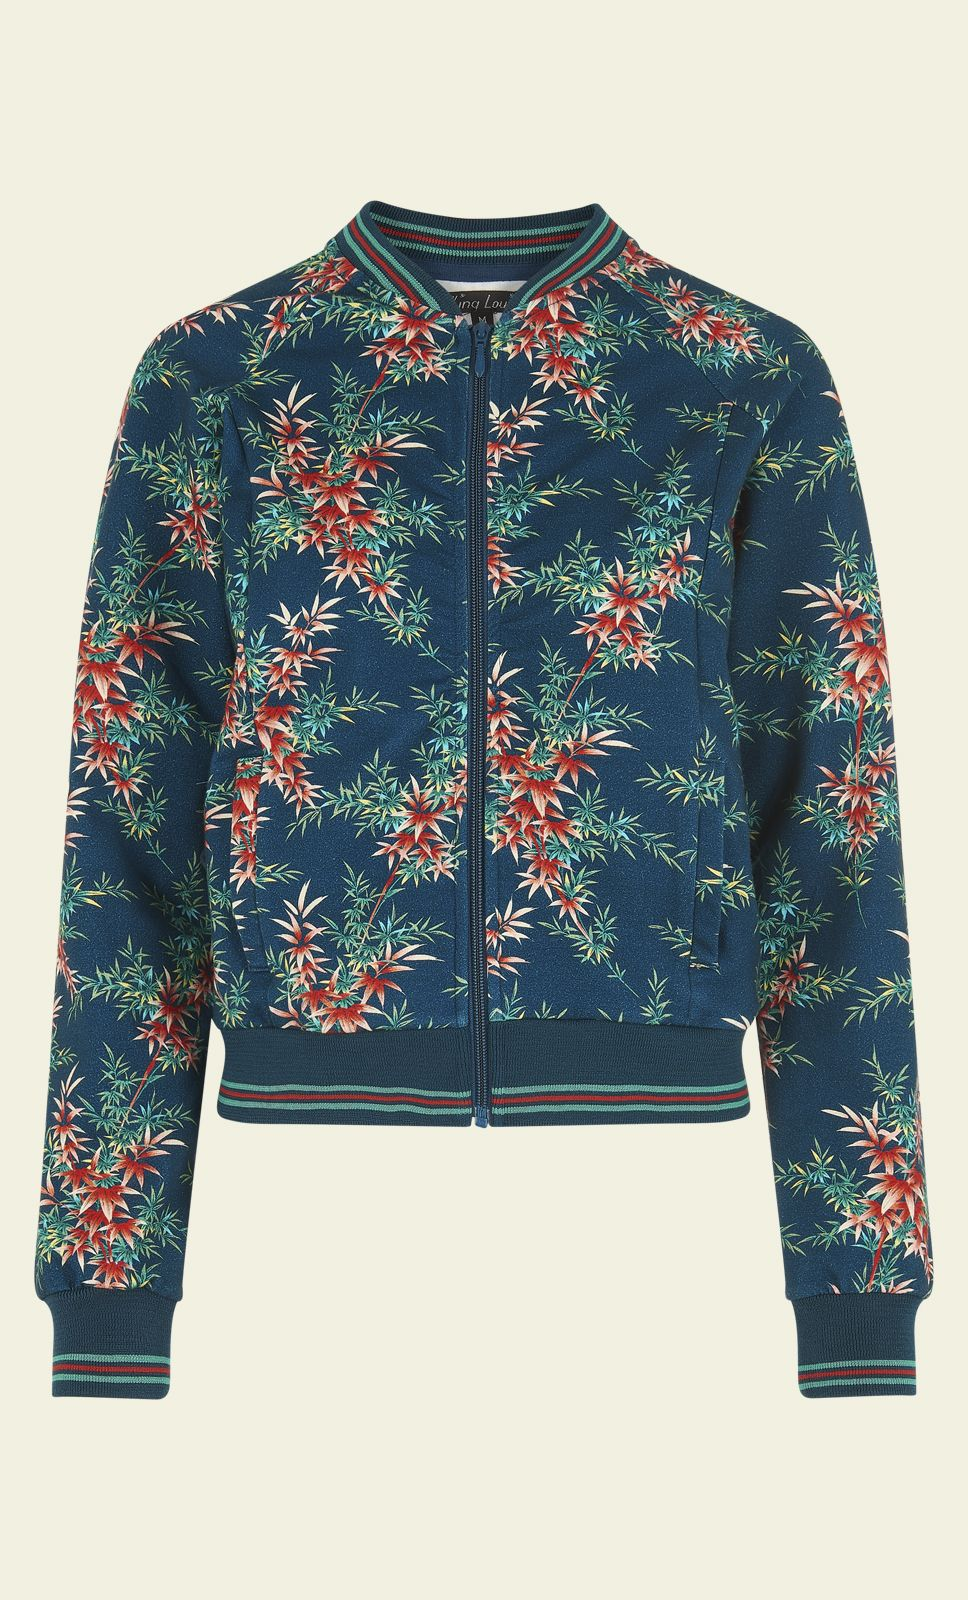 Biba baseball jacket Nara Organic cotton King Louie